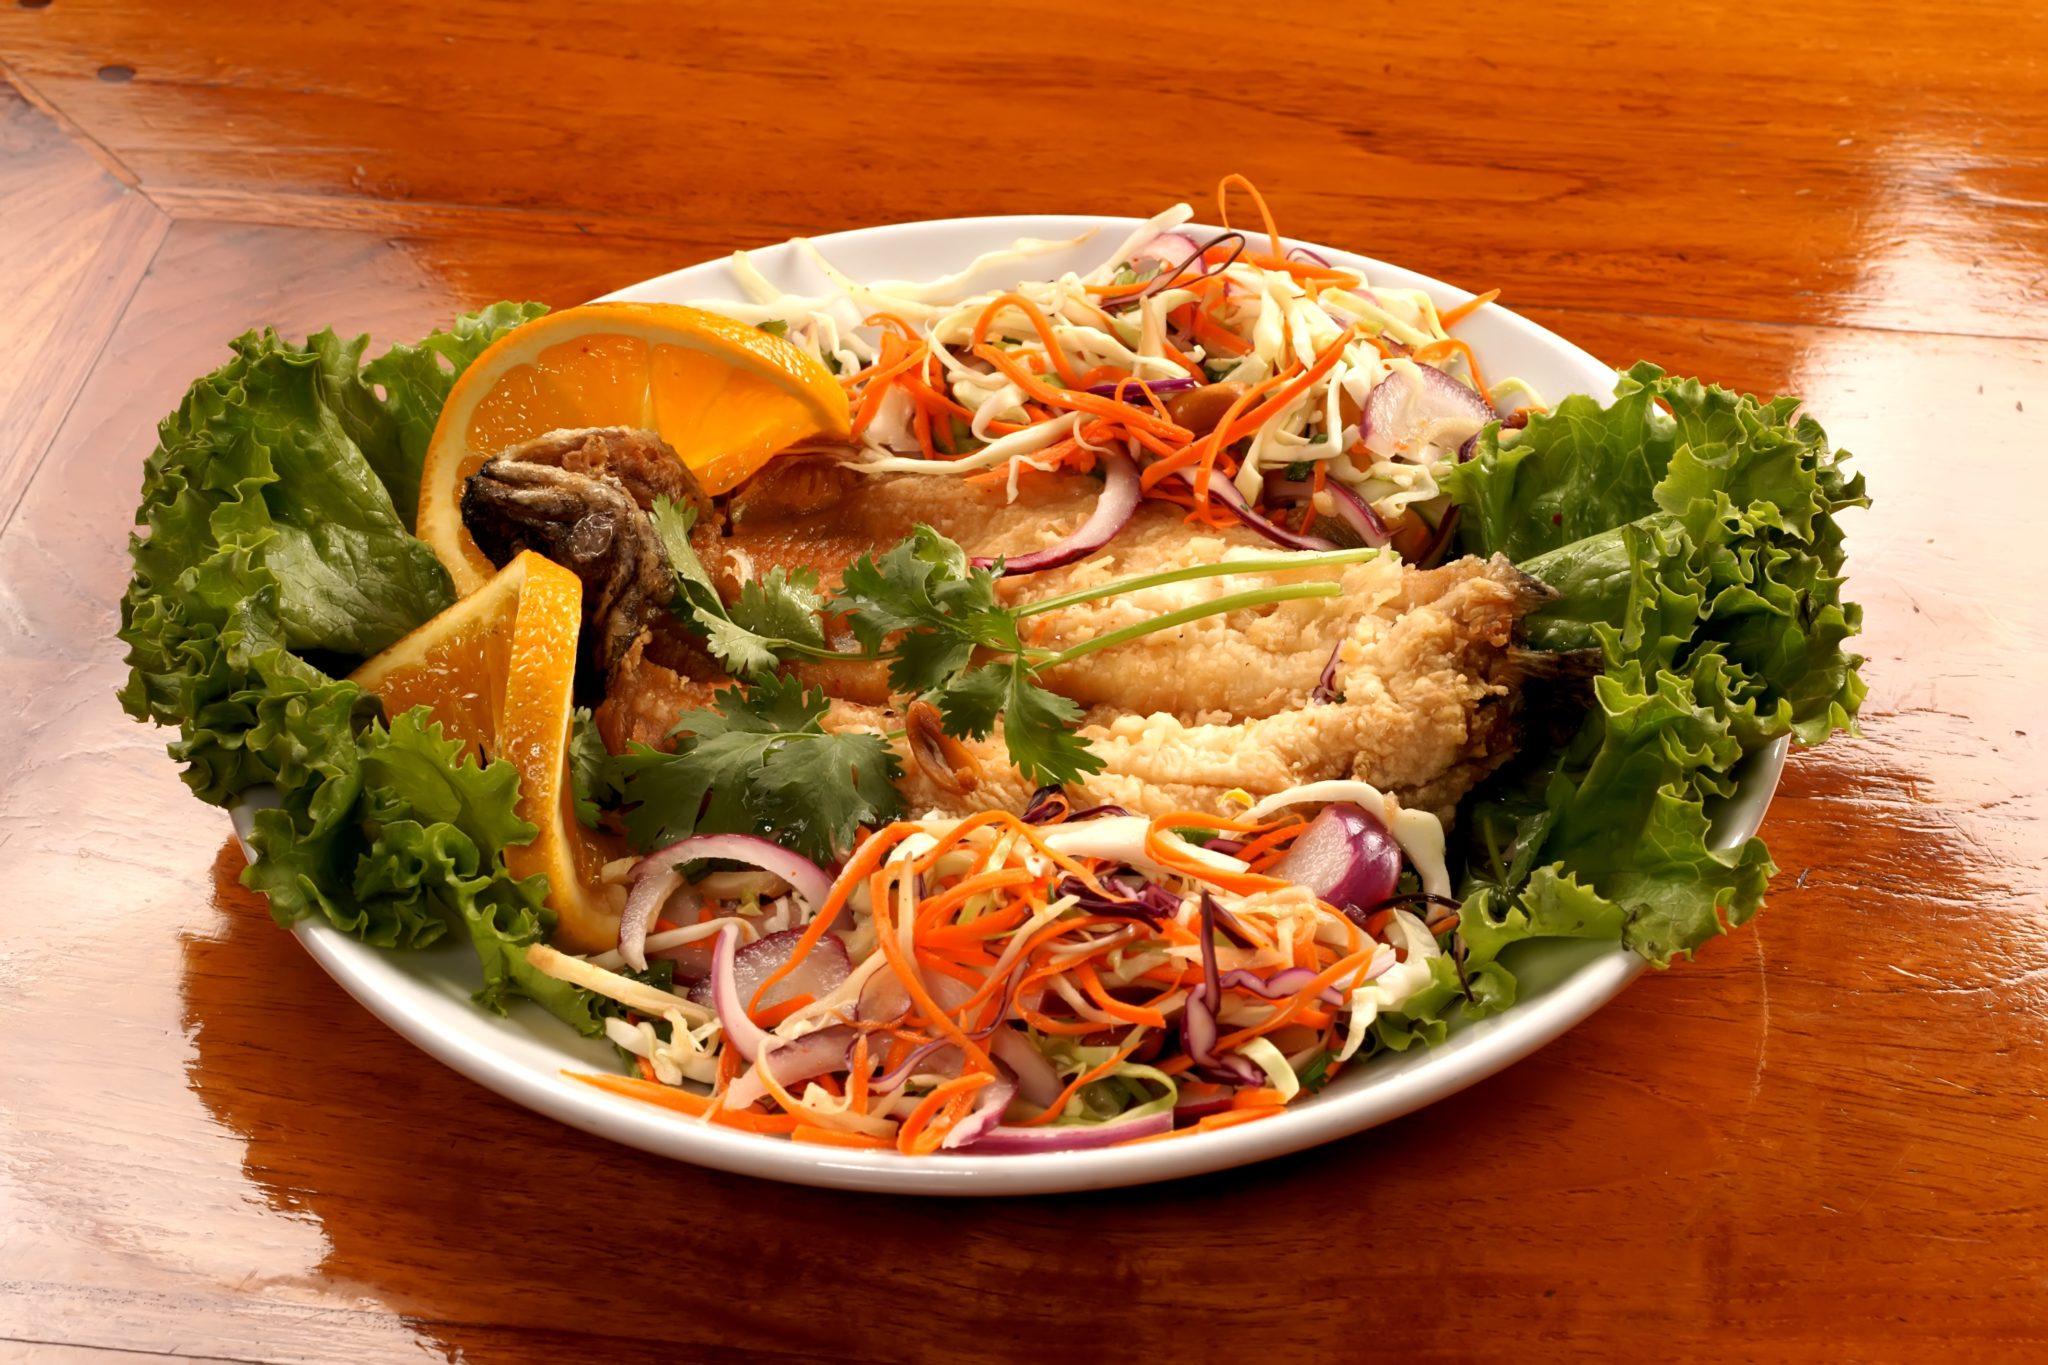 Thai specialties that shouldn't be overlooked